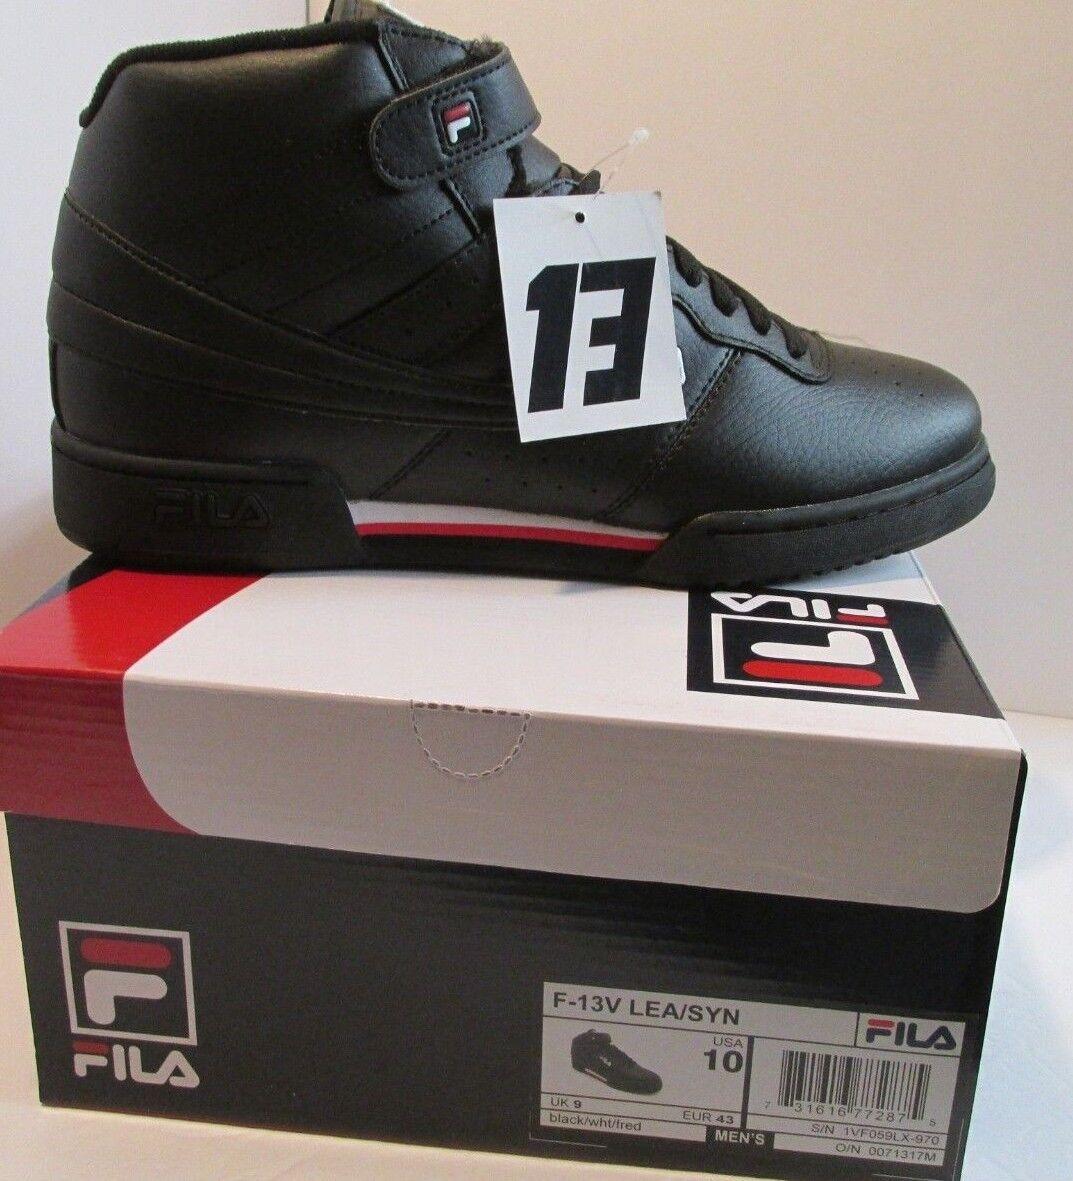 new concept bf96c 96cd4 Mens Fila F-13V F-13V F-13V LEA SYN Hi-Top Basketball scarpe Dimensione 10 nero  rosso bianca (8-1277 c6c82d